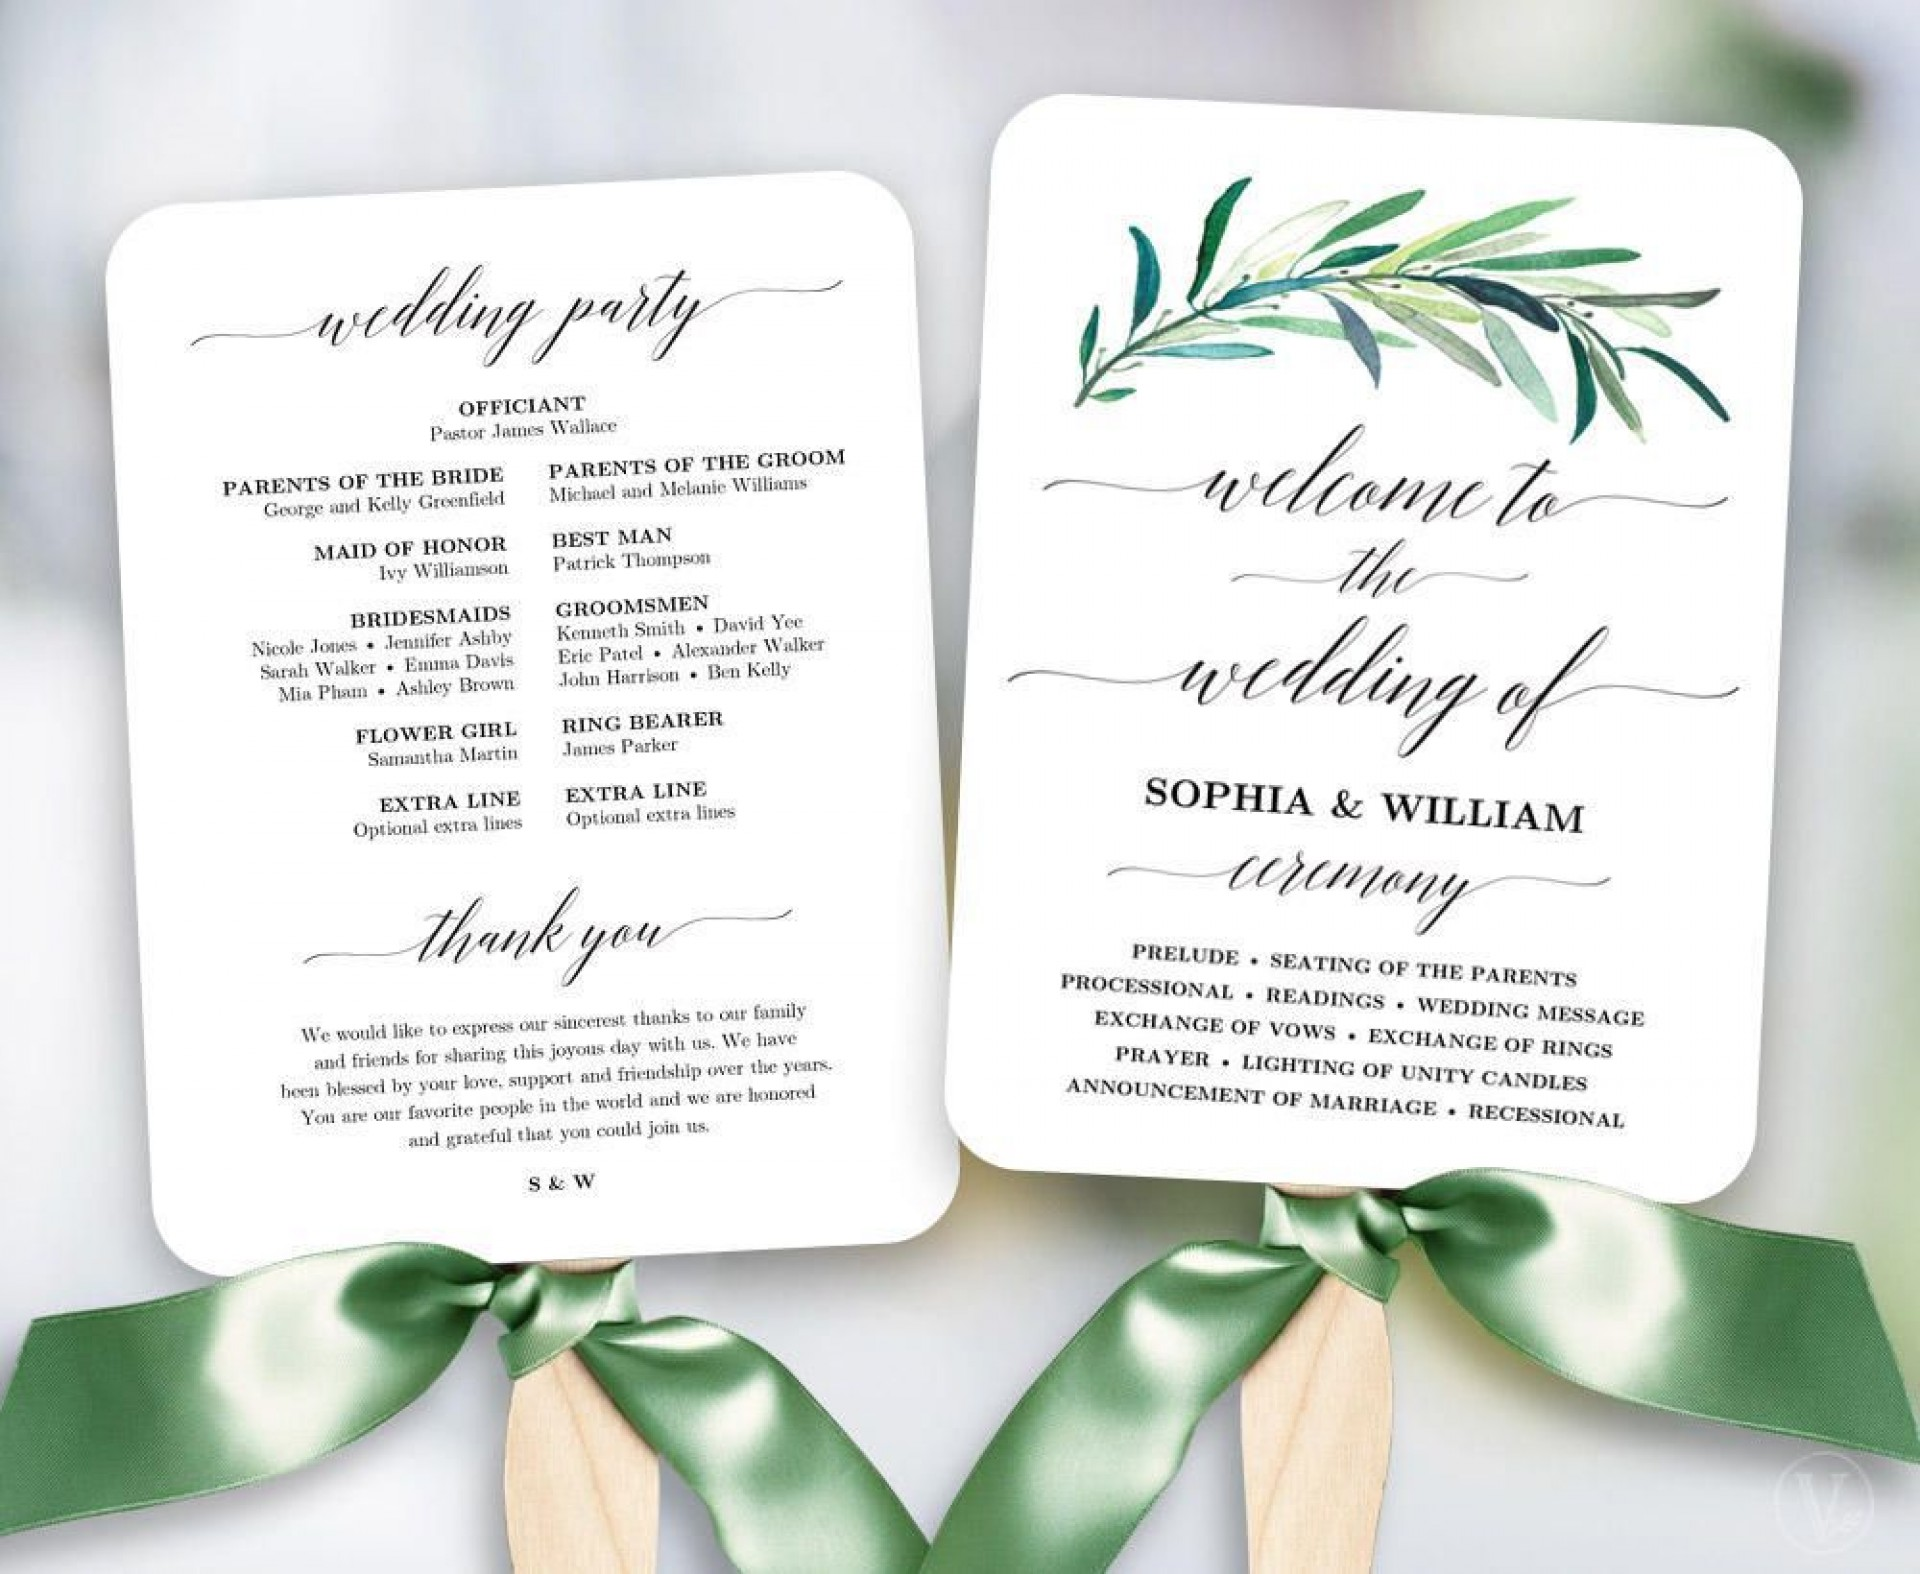 003 Dreaded Free Printable Wedding Program Paddle Fan Template Photo  Templates1920